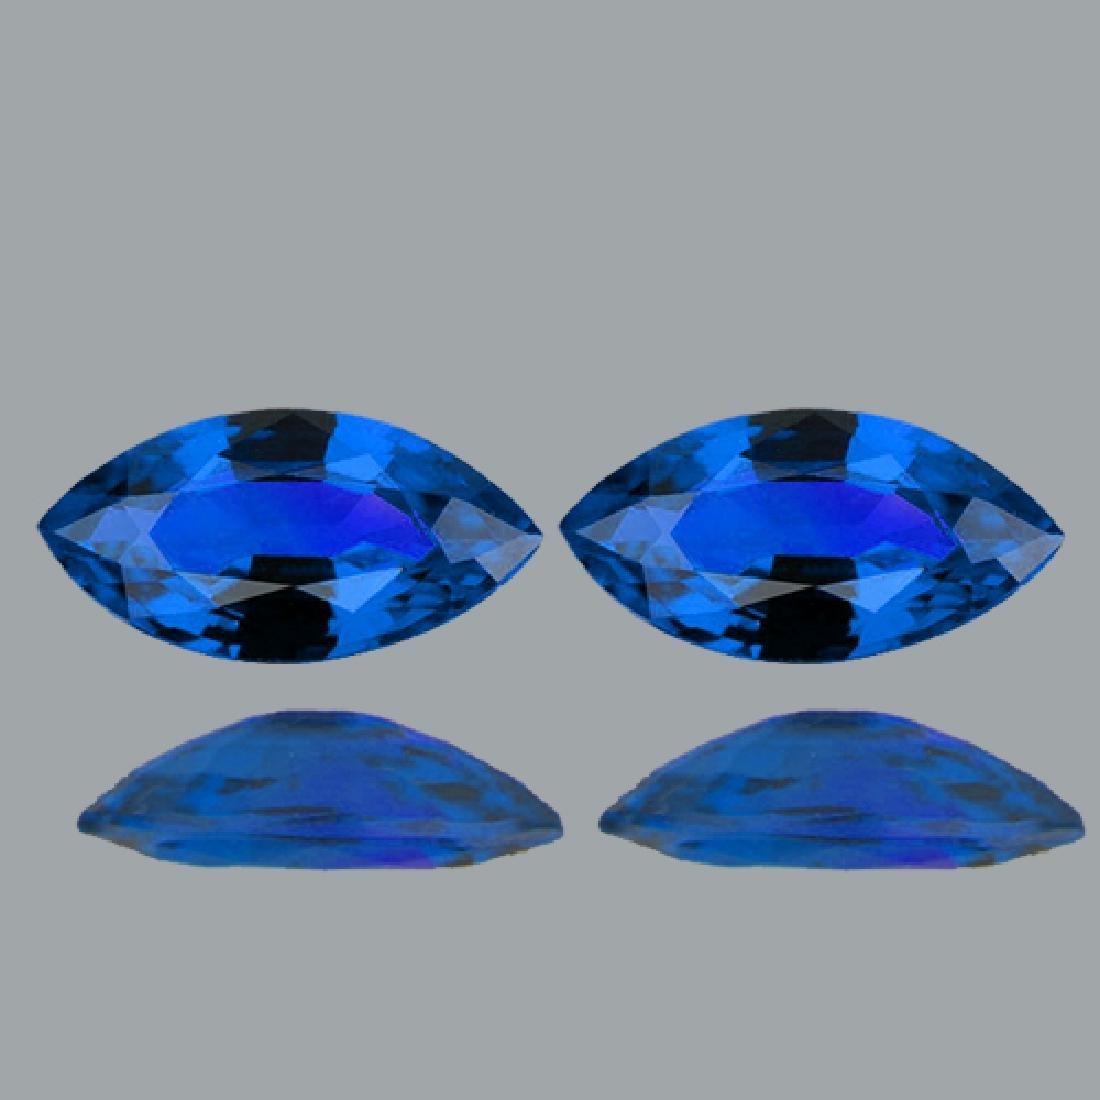 Natural Rare Intense Blue Hauyne 4 x 2 MM - VVS